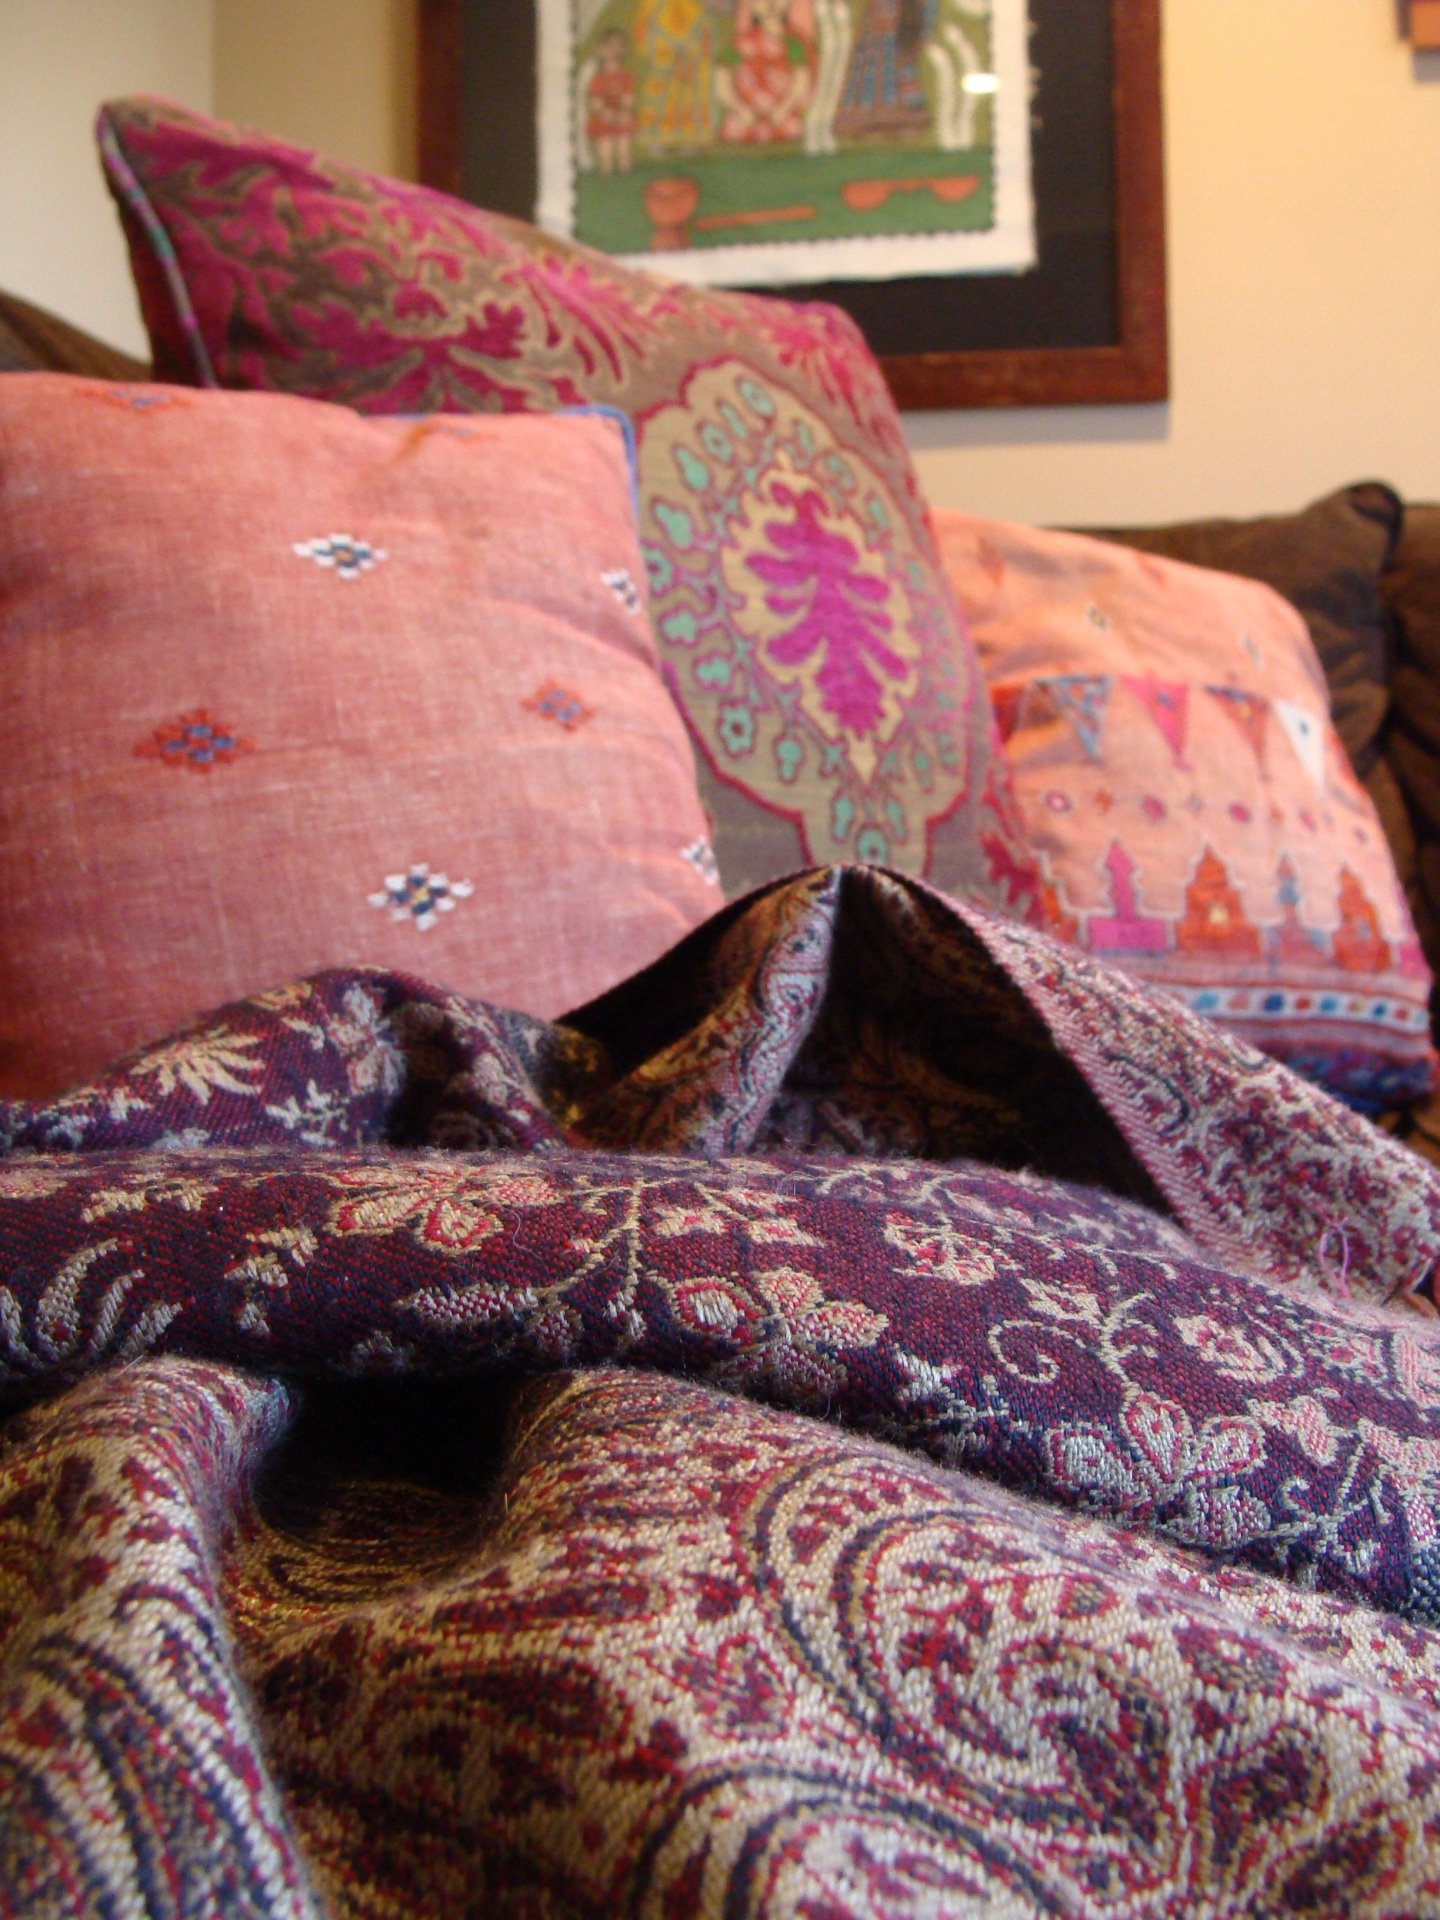 Fiorito Interior Design, interior design, remodel, television room, sectional, pillows, throw, ethnic, eclectic